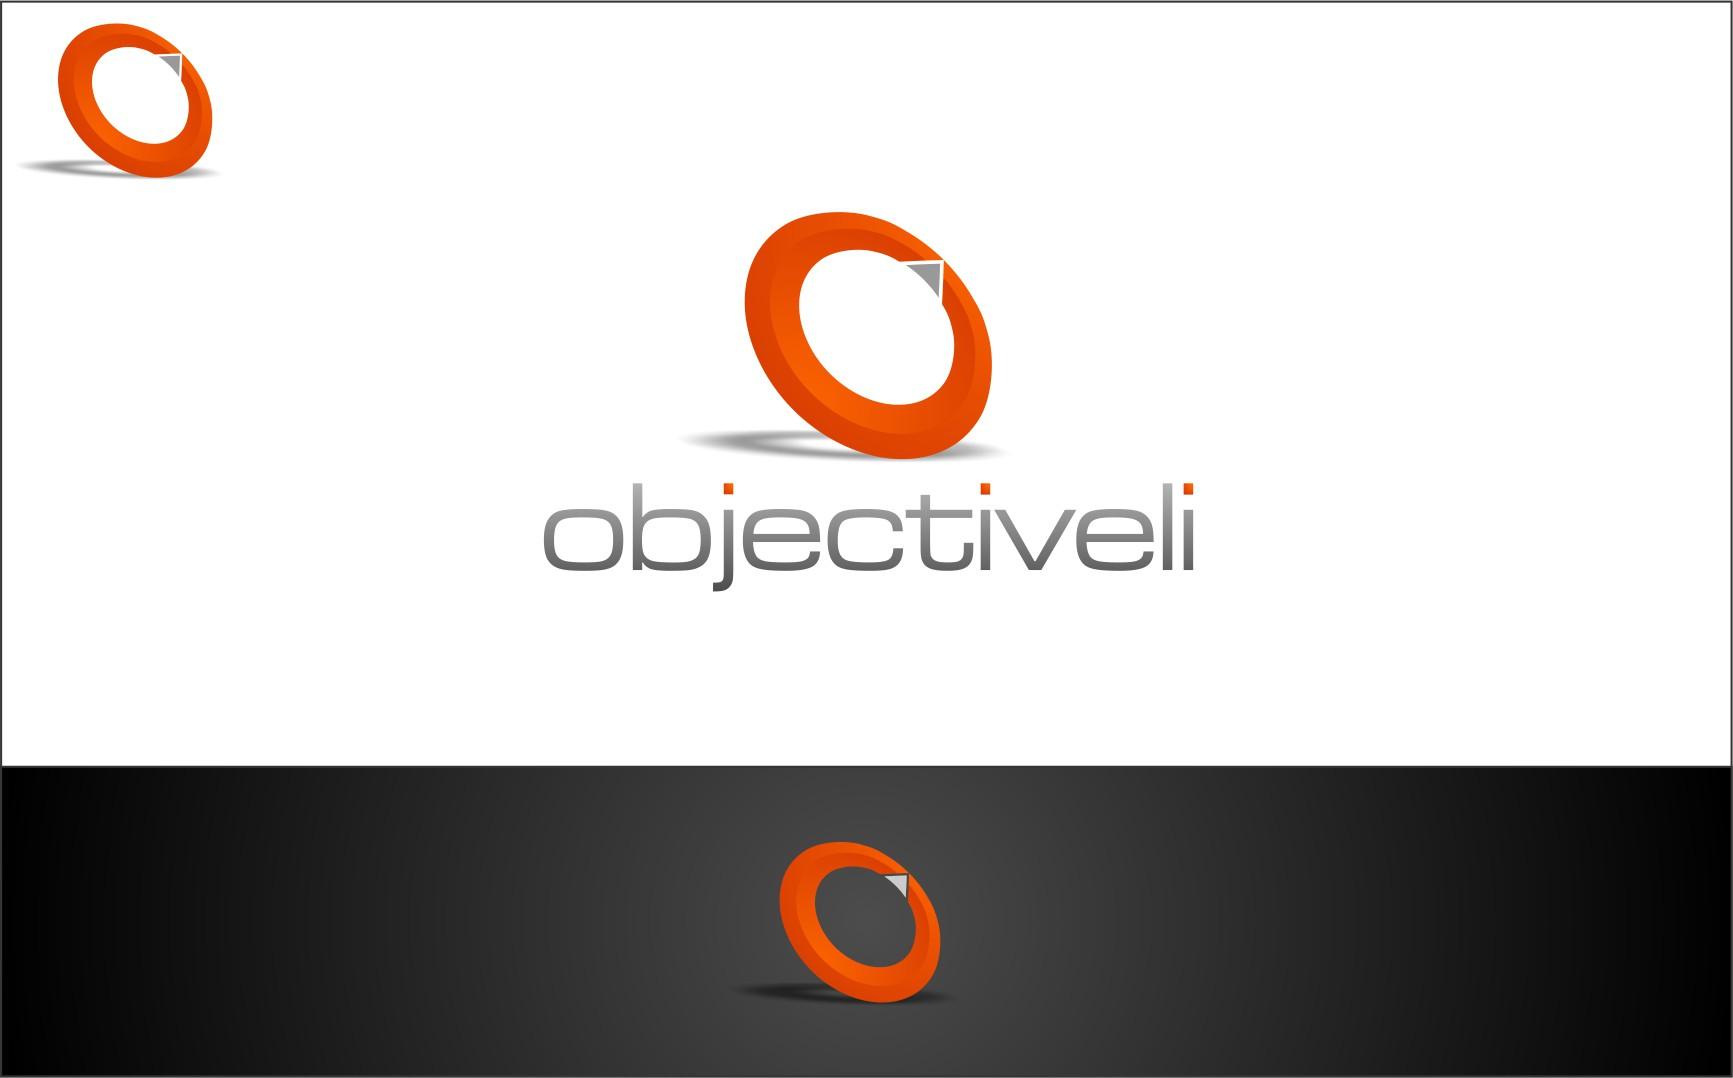 Objectiveli needs a new logo